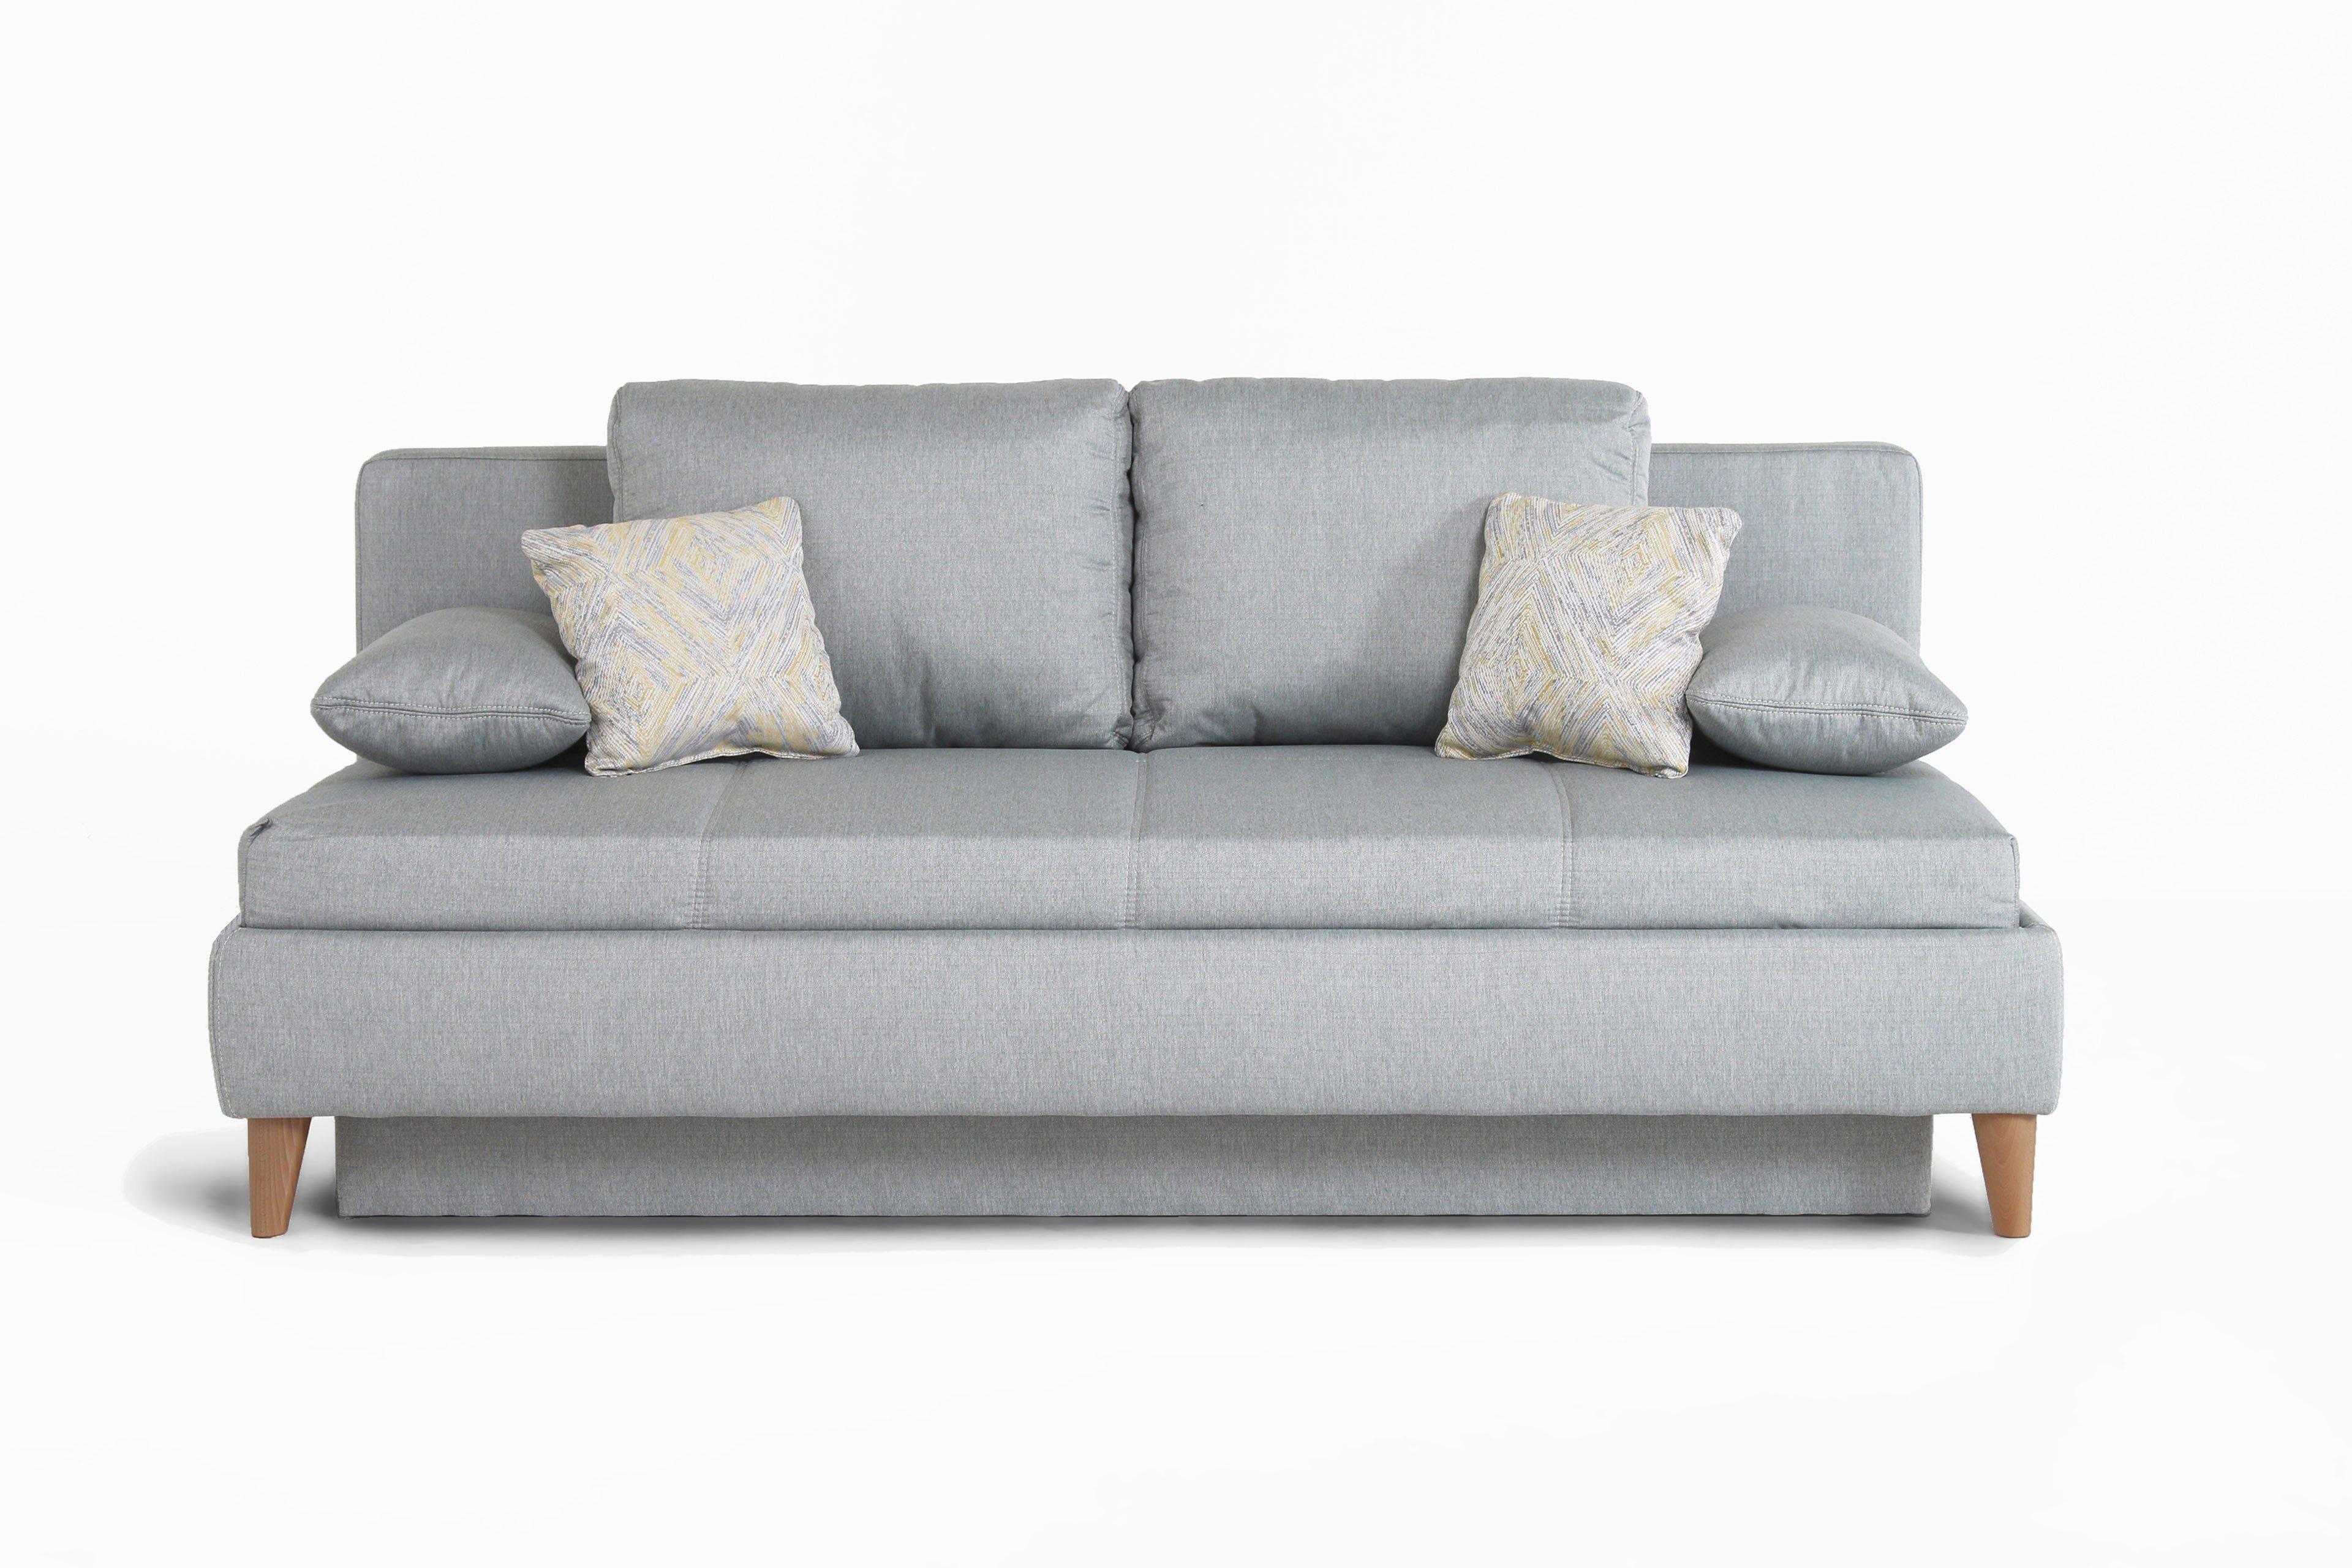 jockenh fer schlafsofa merlin momo dauerschl fer in. Black Bedroom Furniture Sets. Home Design Ideas